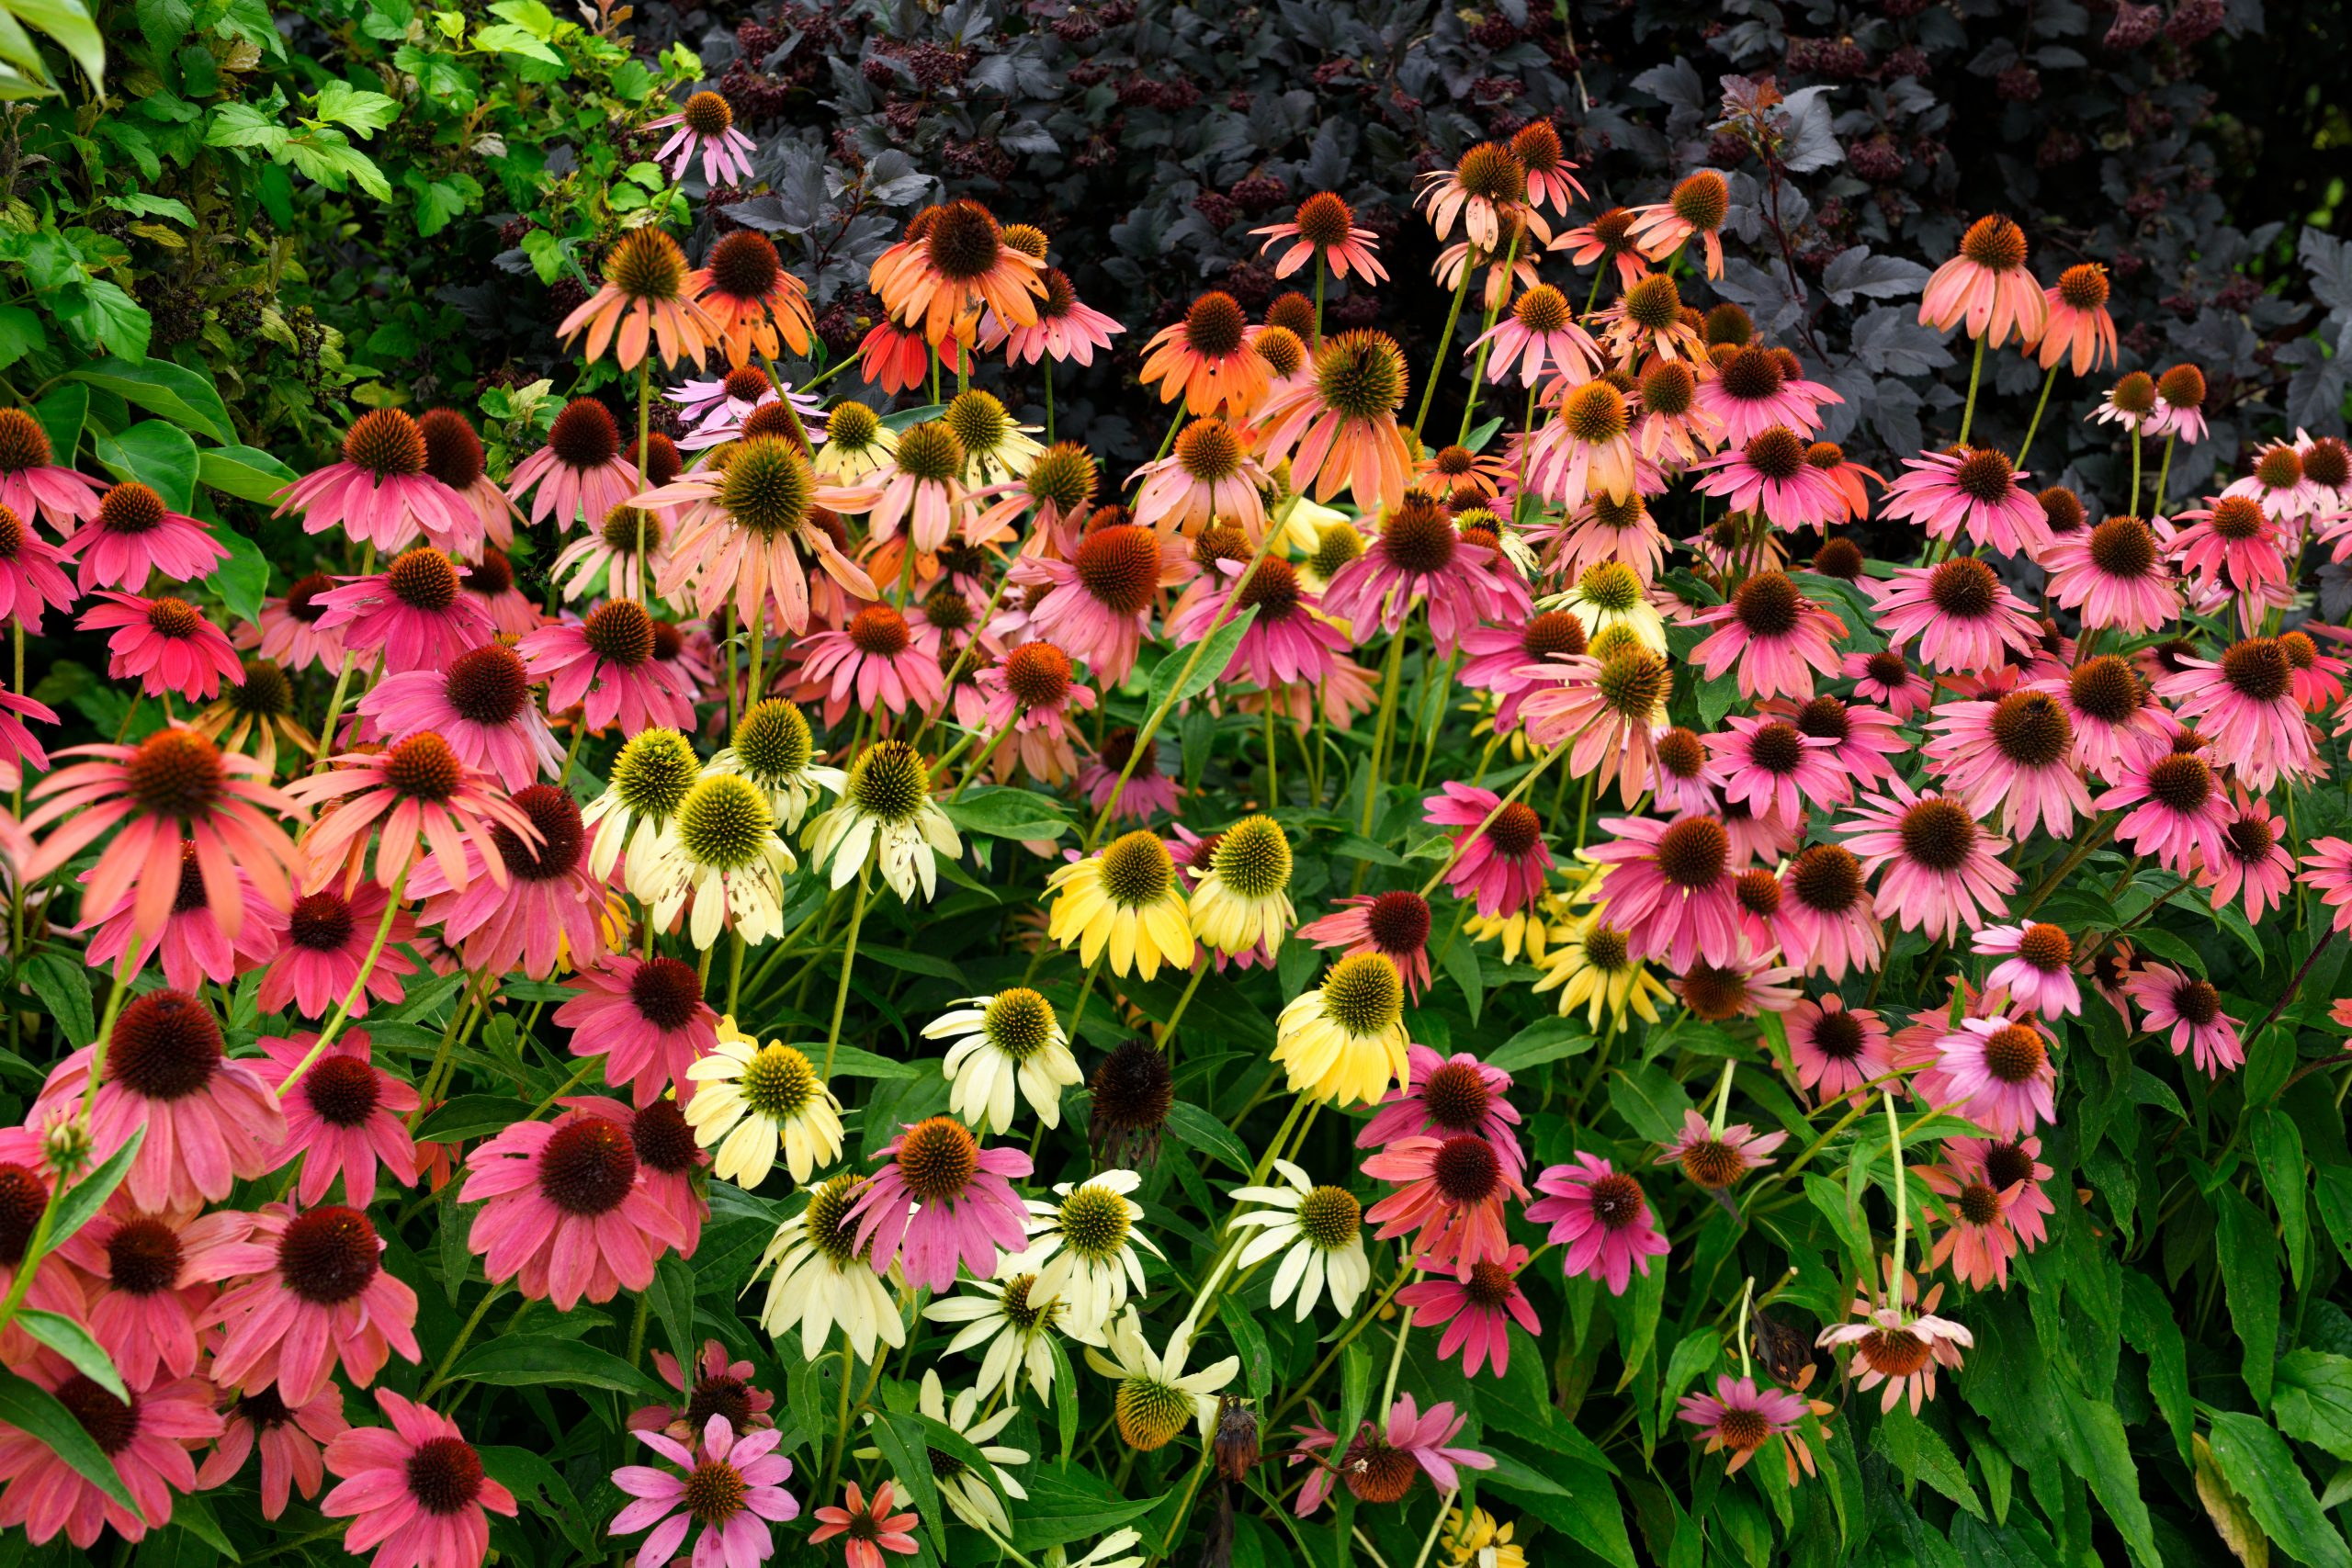 Pink,Orange,And,Yellow,Echinacea,Coneflowers,In,A,Wet,Garden